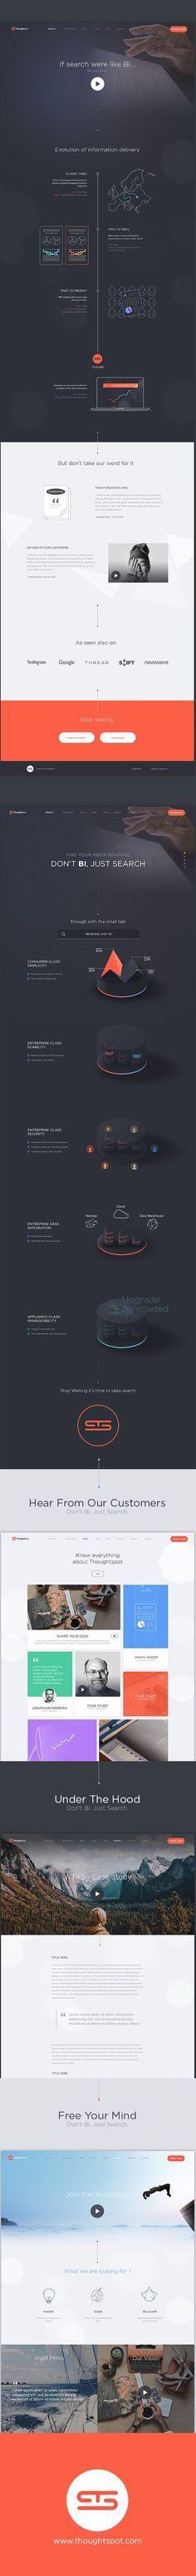 Creative UI and UX Design Work